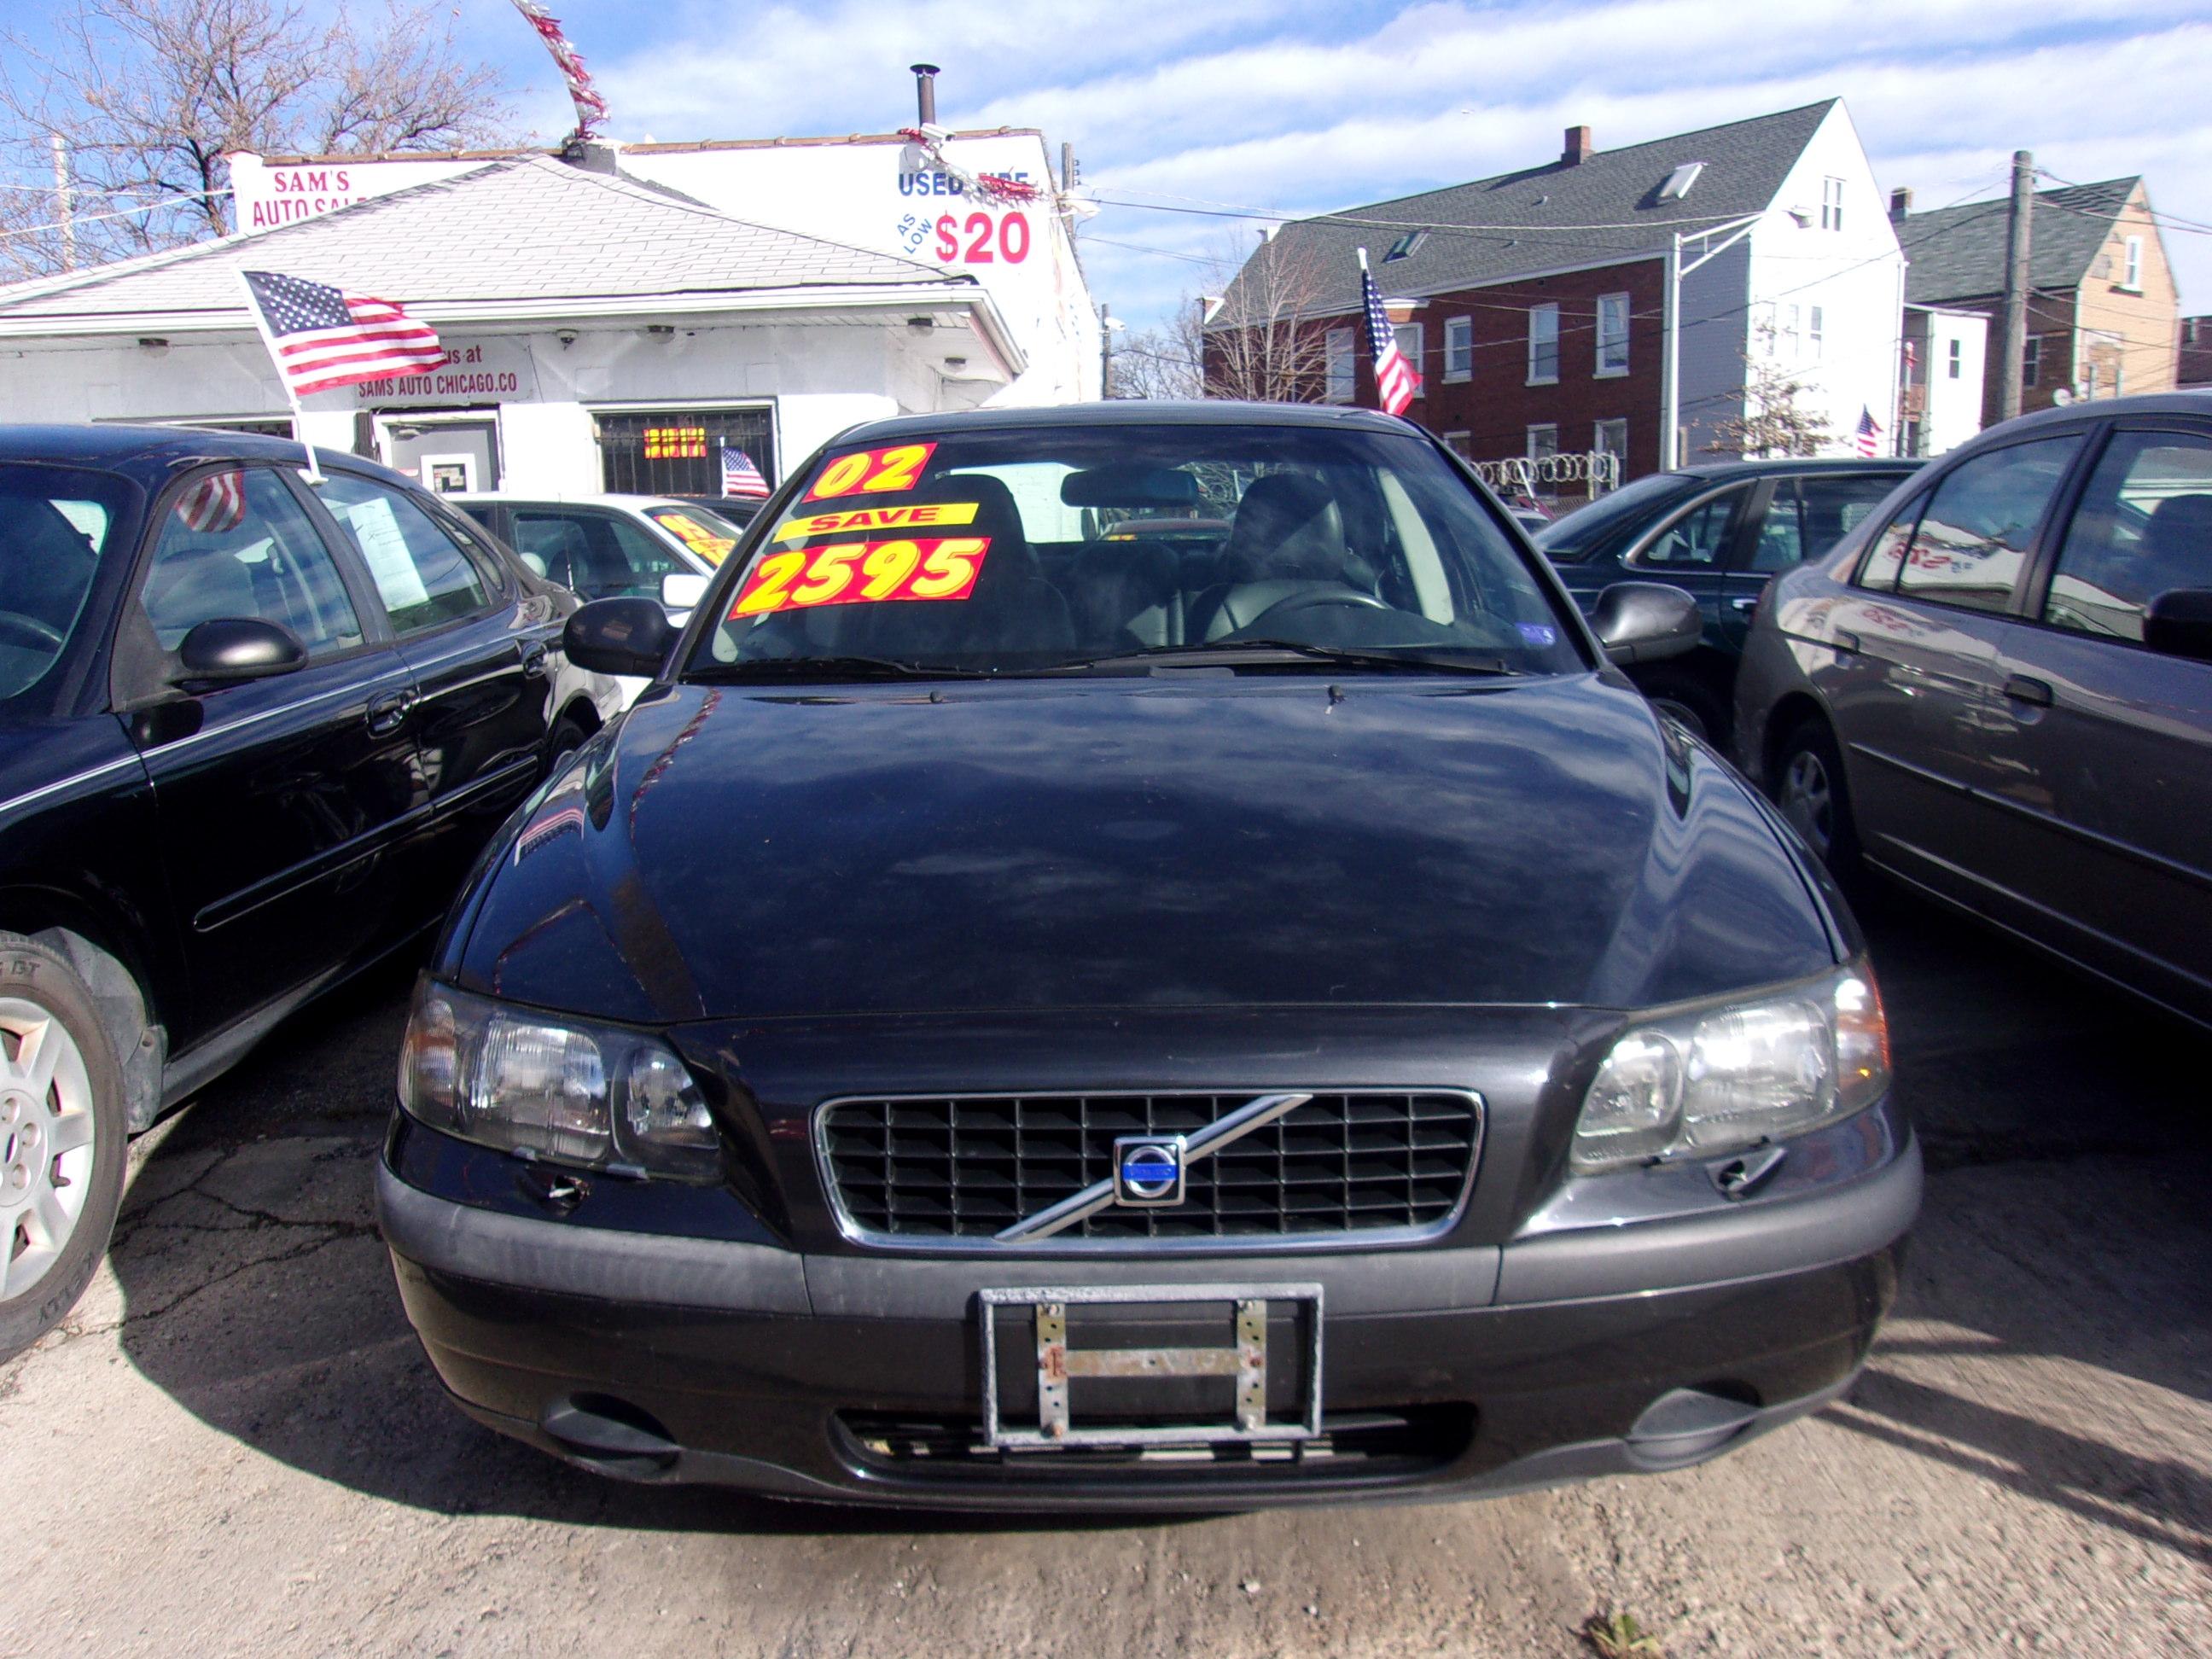 Sams Auto Sales >> Sams Auto Sales Used Cars In Chicago 3377 N Milwaukee